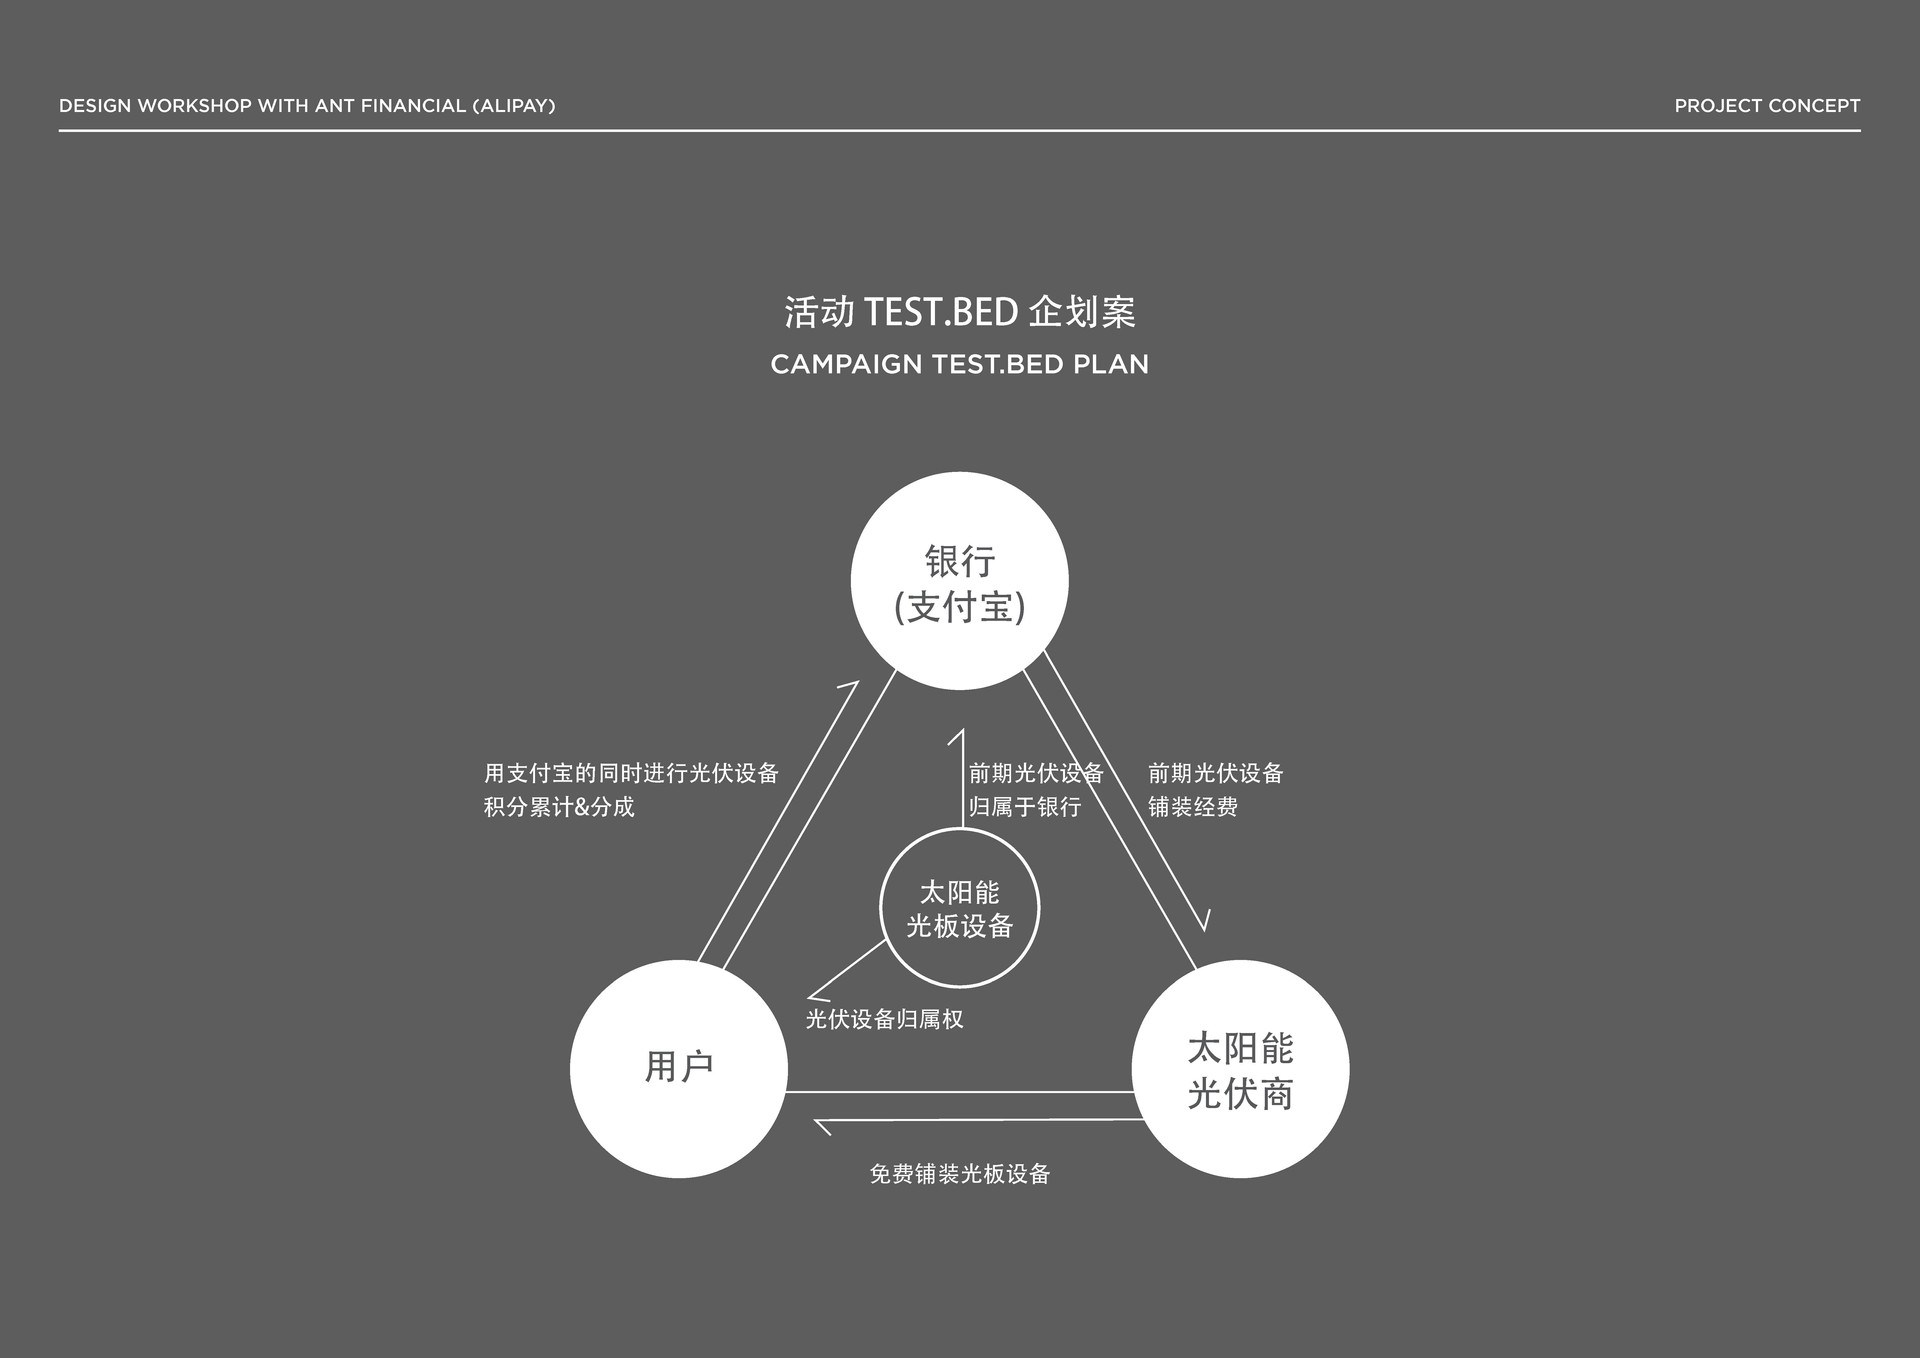 alipay_workshop_中文_페이지_26.jpg